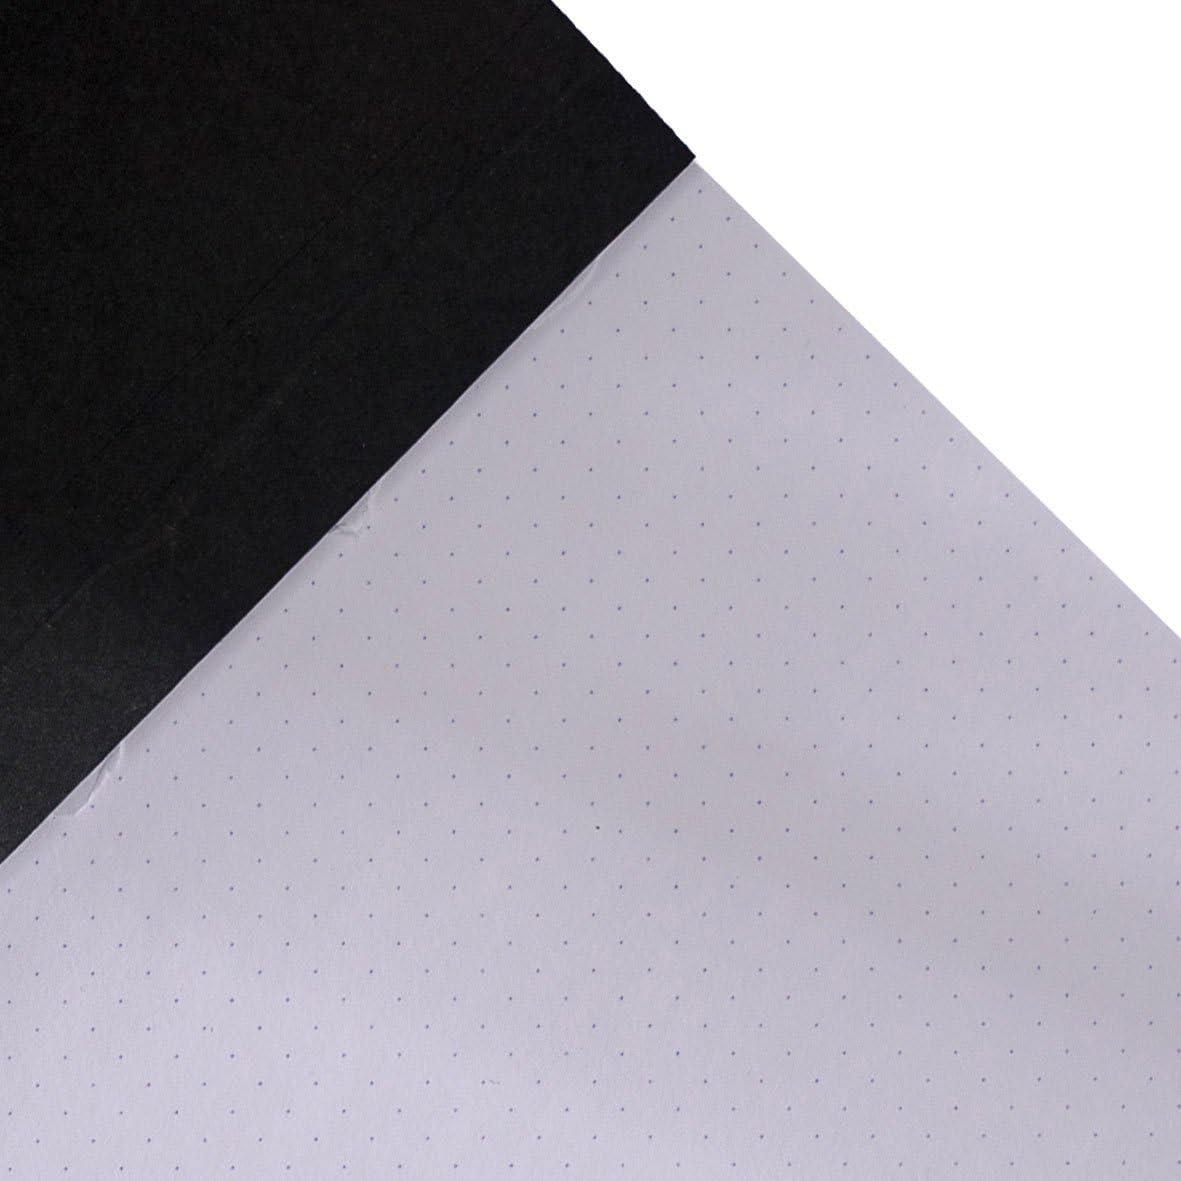 (6 x 8 Dots, Assorted Colors) - Clairefontaine GraF it Sketch Pad, 90 g Paper, 15cm x 21cm, Dot Grid